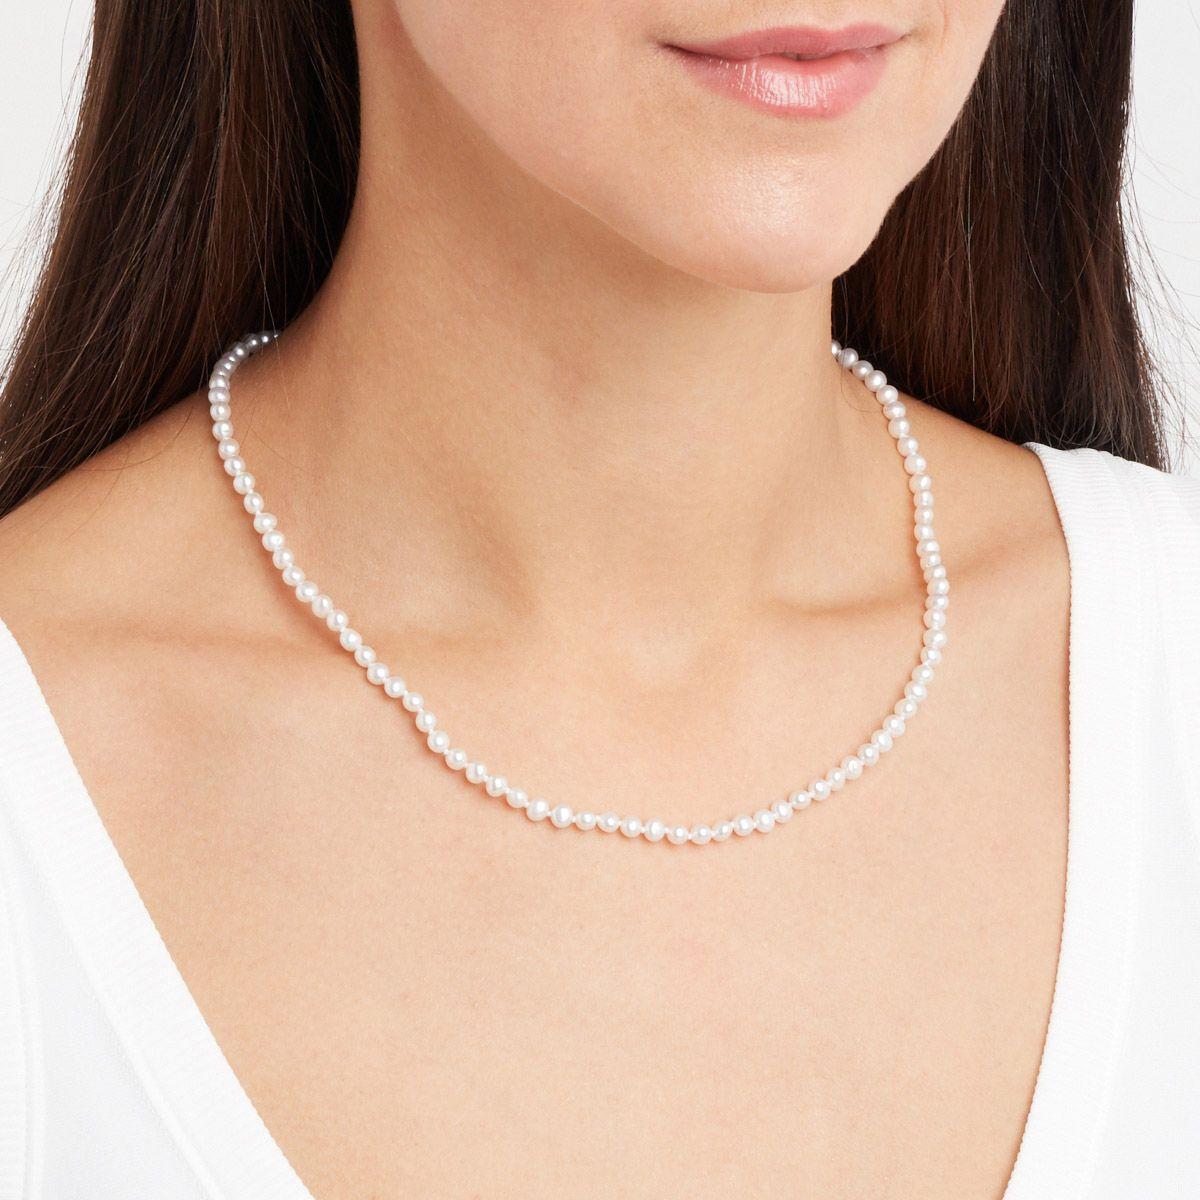 Viviane - PerlenKetten - Silber